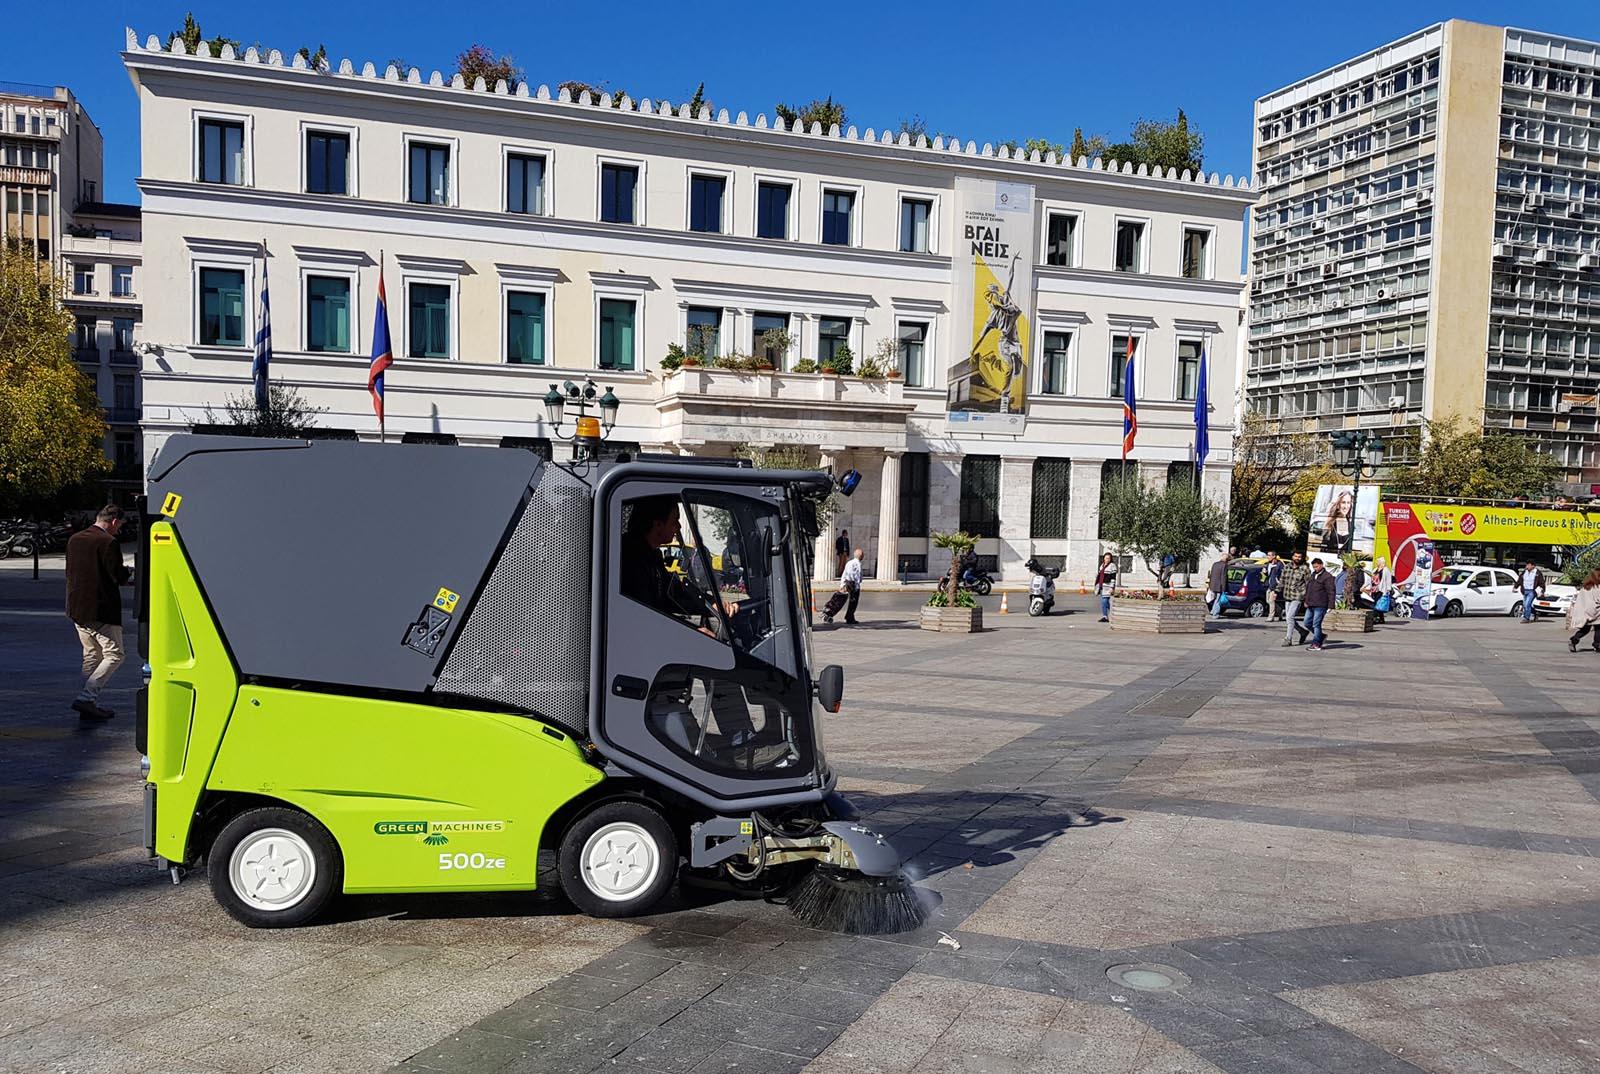 Photo of Green Machines: Τα νέα ηλεκτροκίνητα σάρωθρα που διατηρούν την πόλη καθαρή [vid]